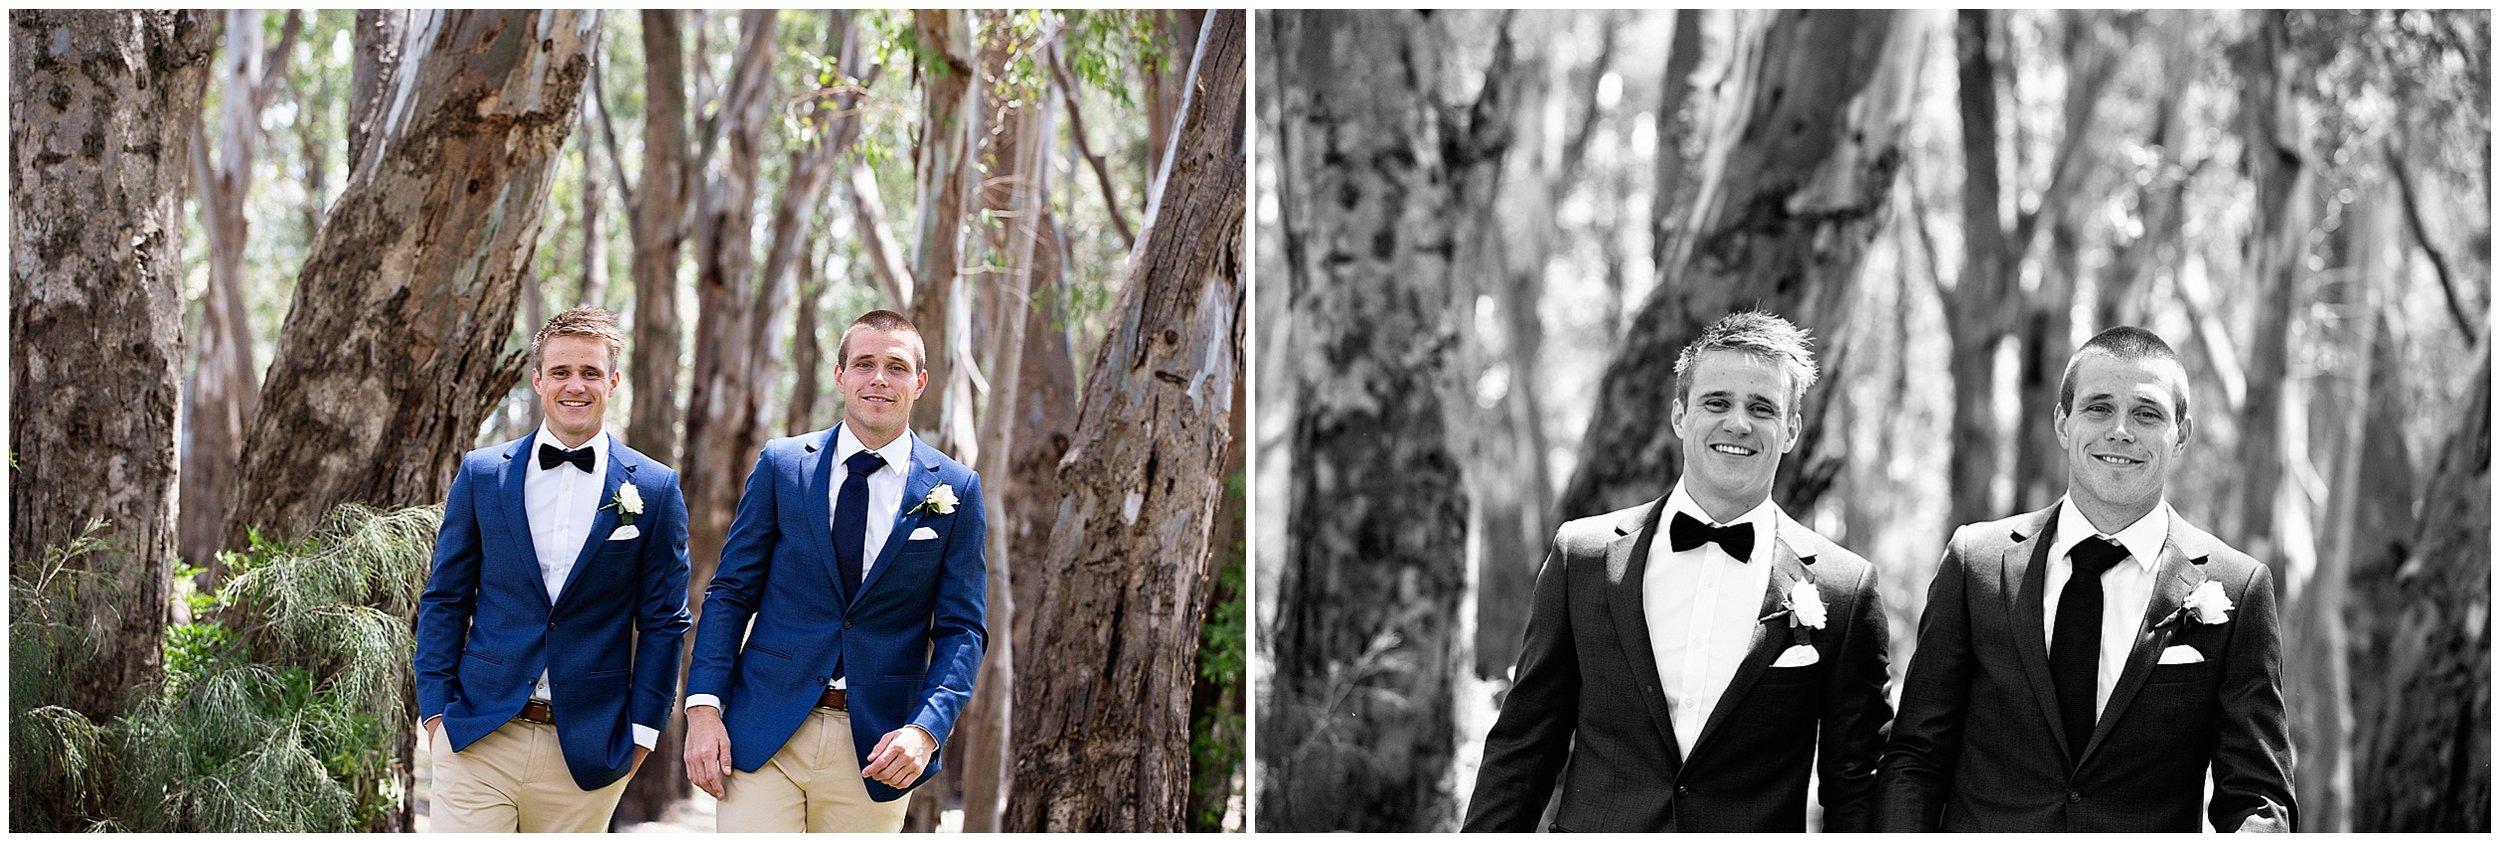 shepparton-wedding-photographer_0079.jpg